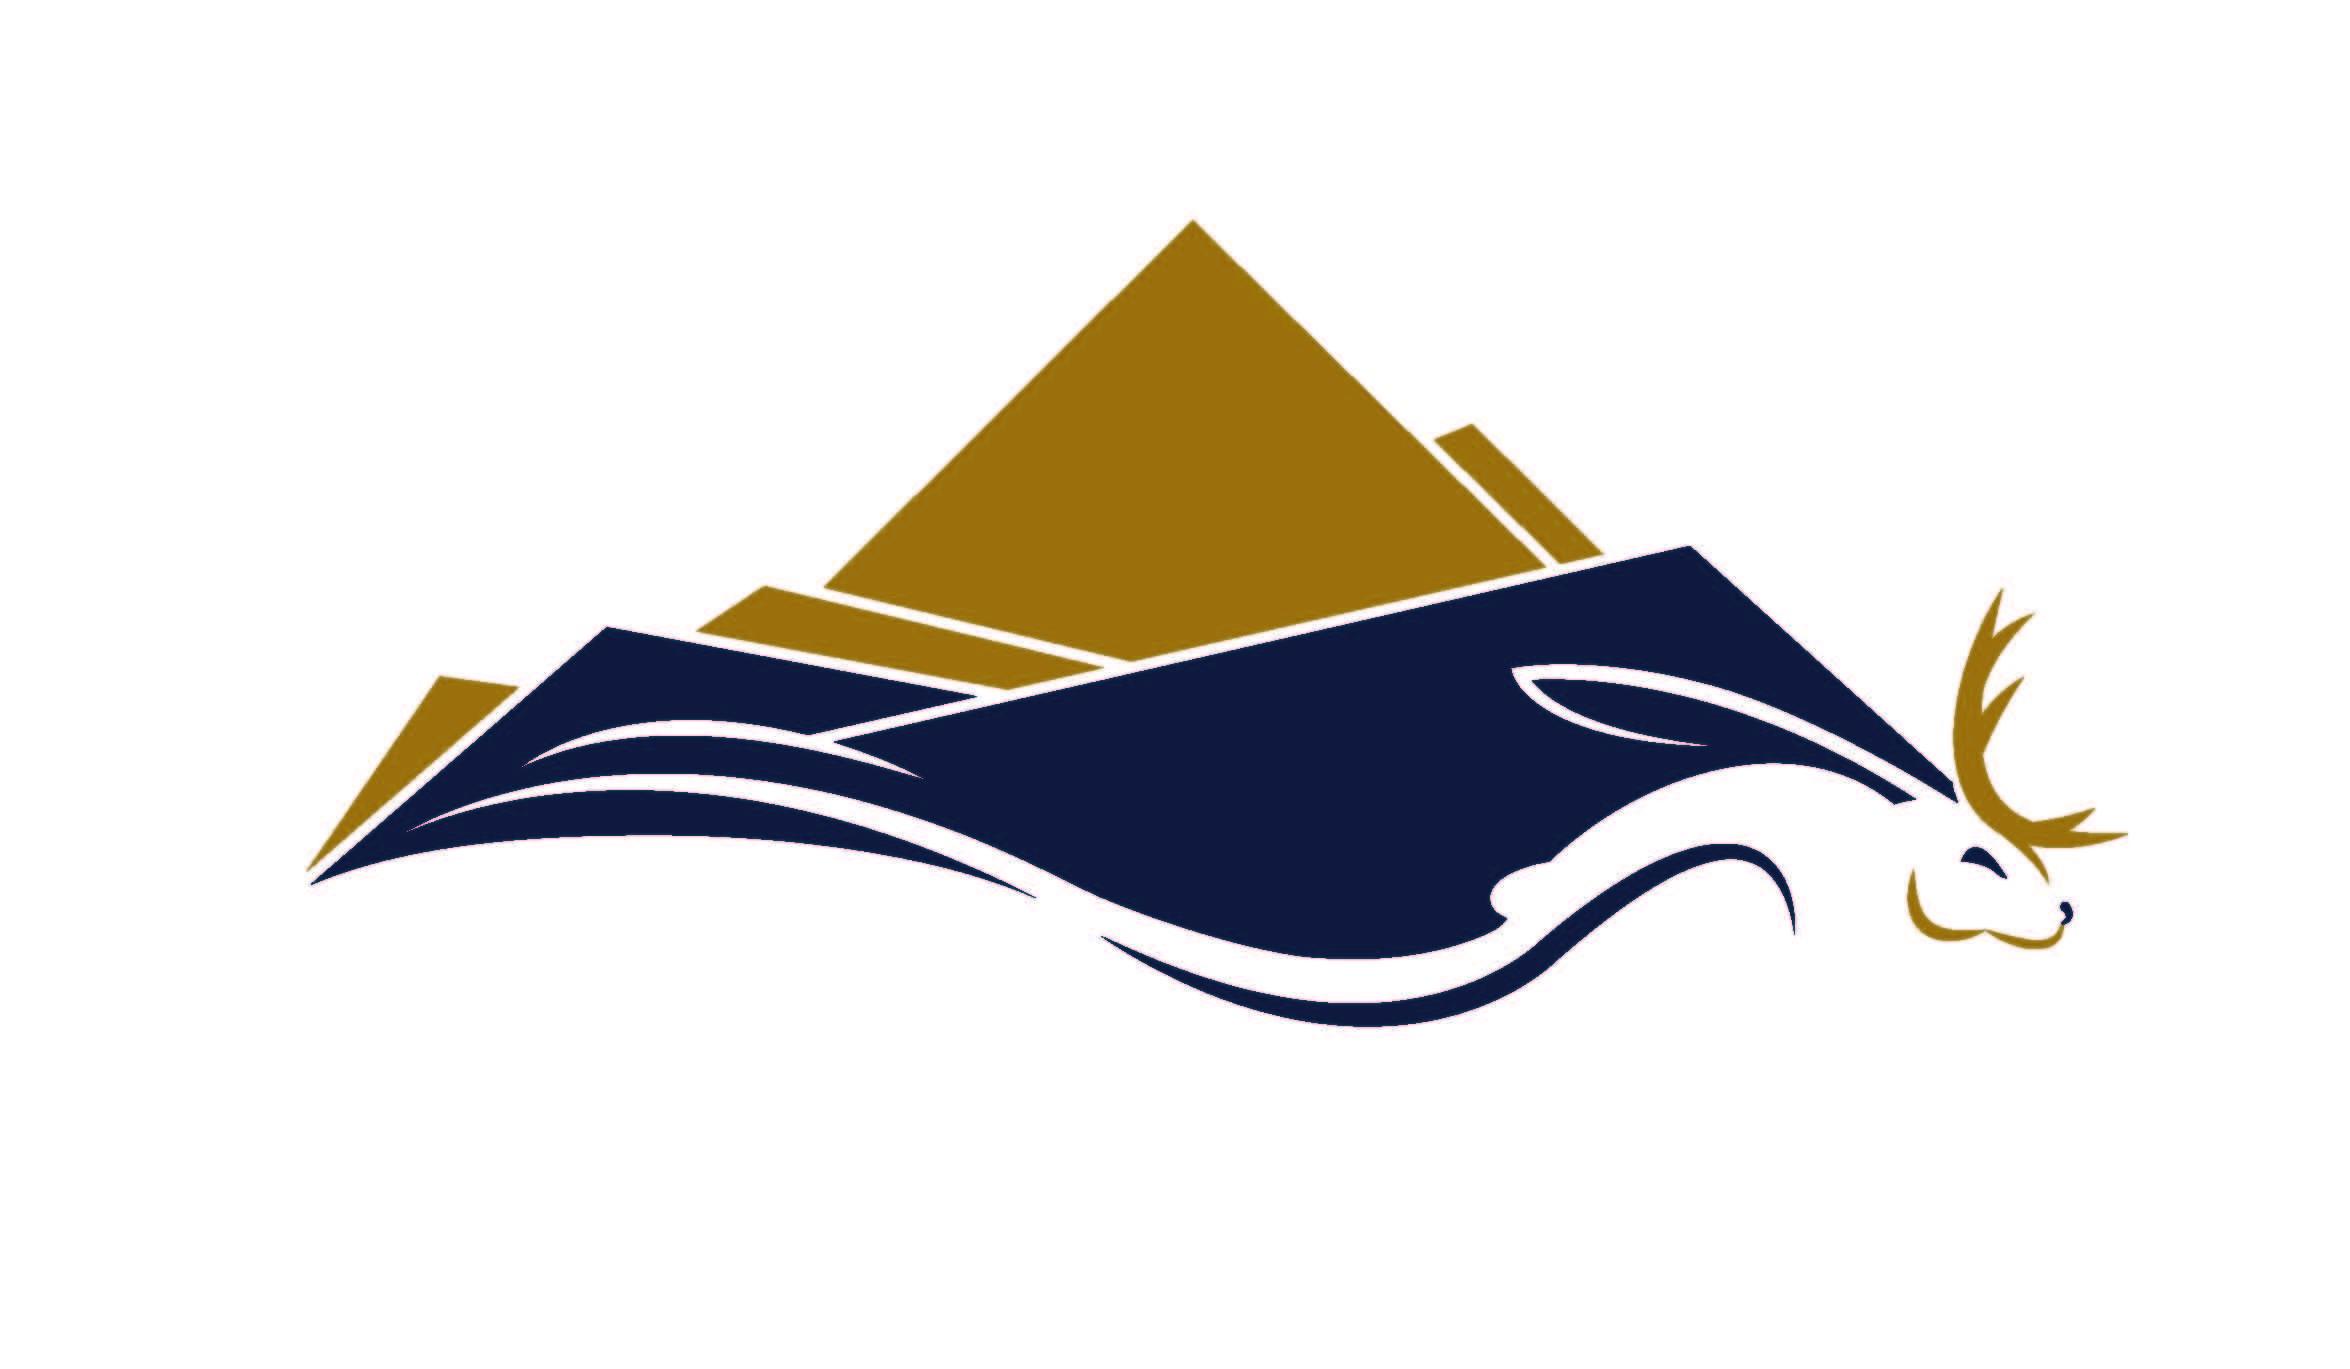 City_of_Douglas_Logo_Page_1.jpg